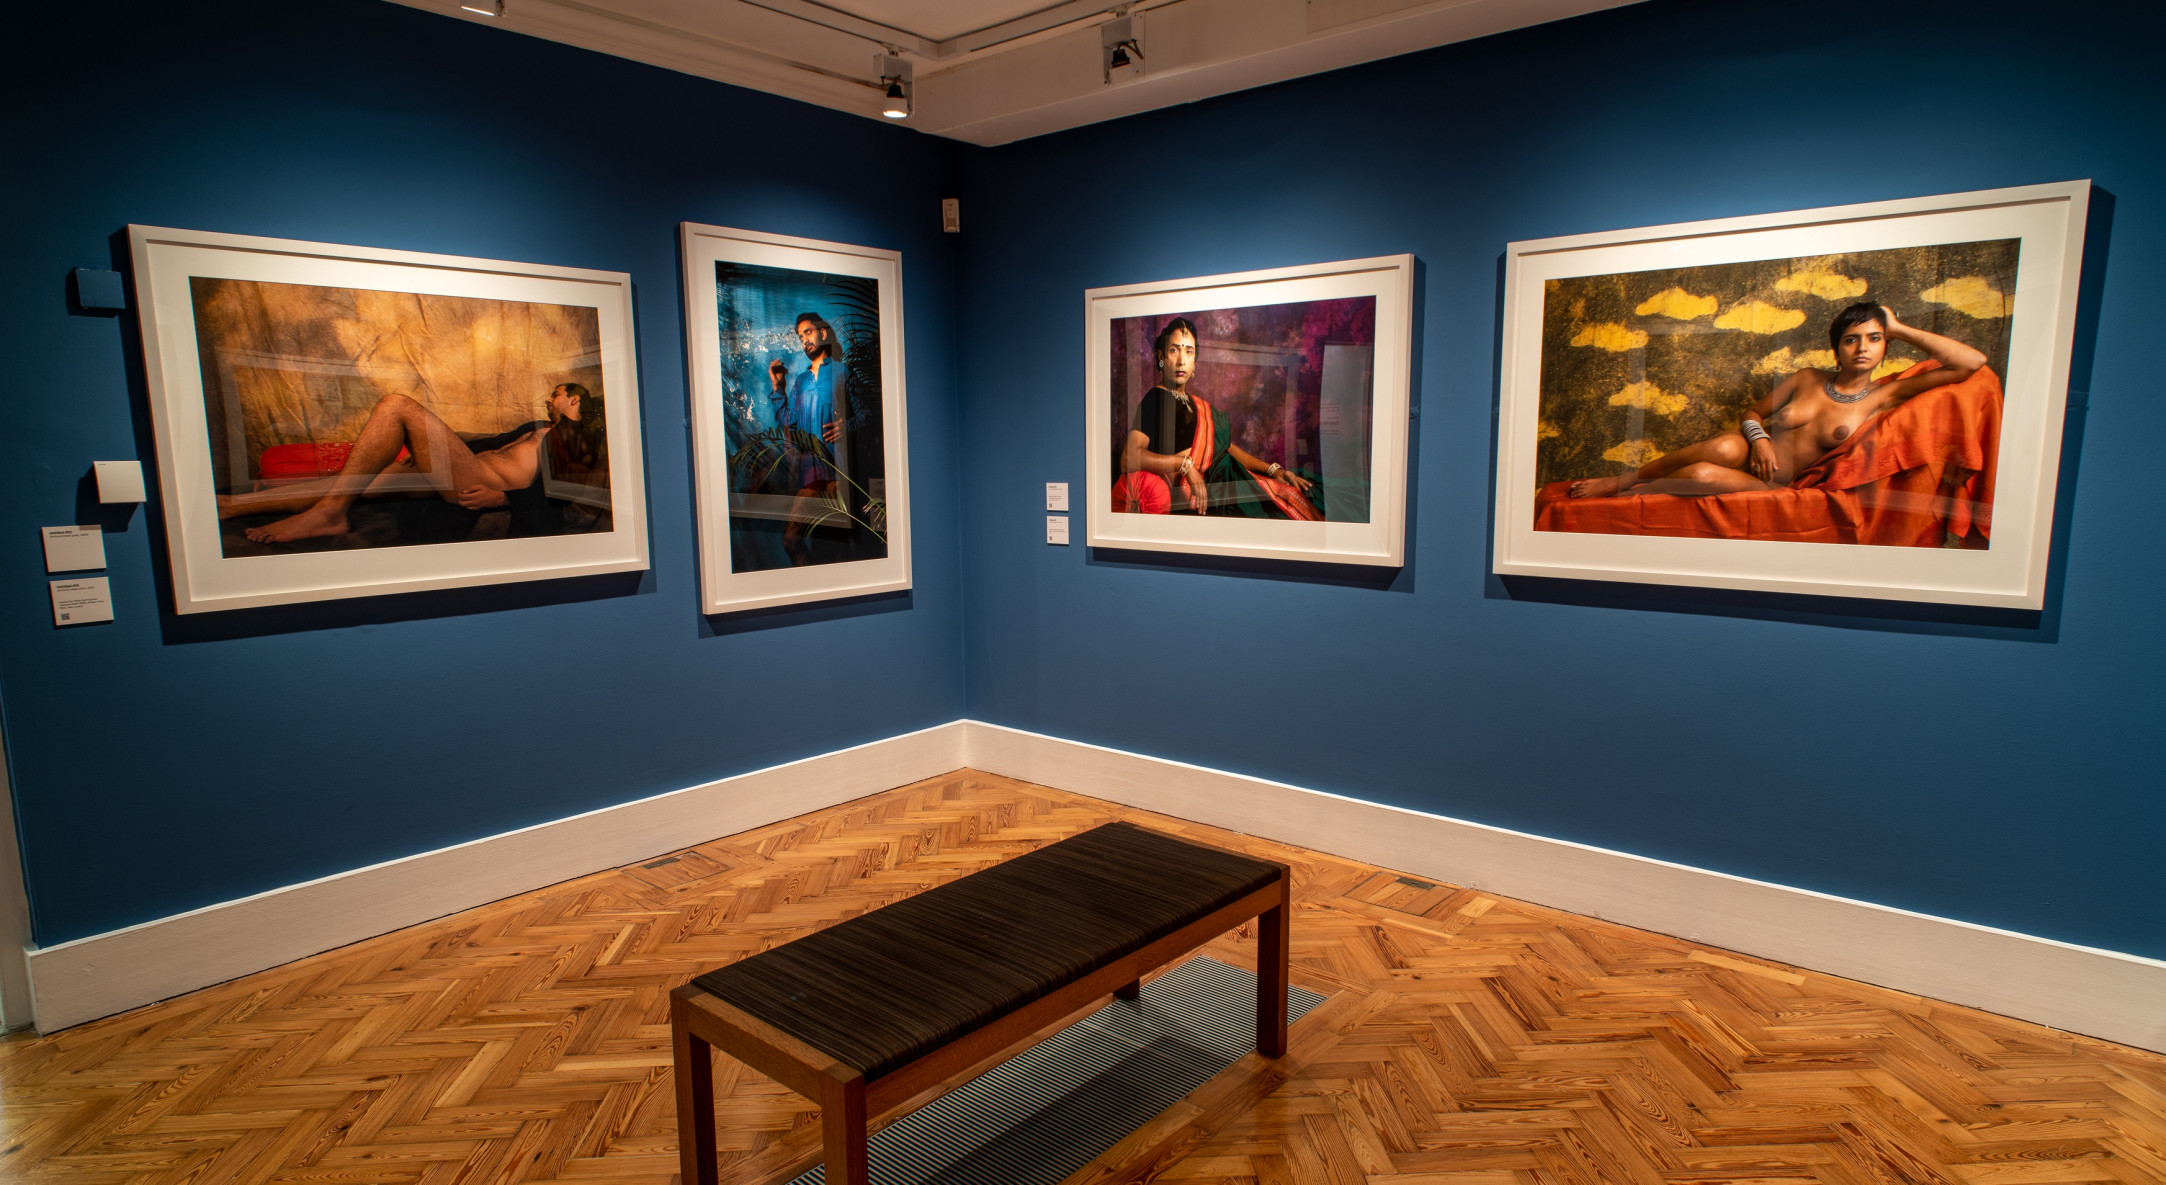 Sunil Gupta, The New Pre-Raphaelites, The Holburne Museum, 24 September 2021 – 19 January 2022. Photo by Peter Stone © Holburne Museum